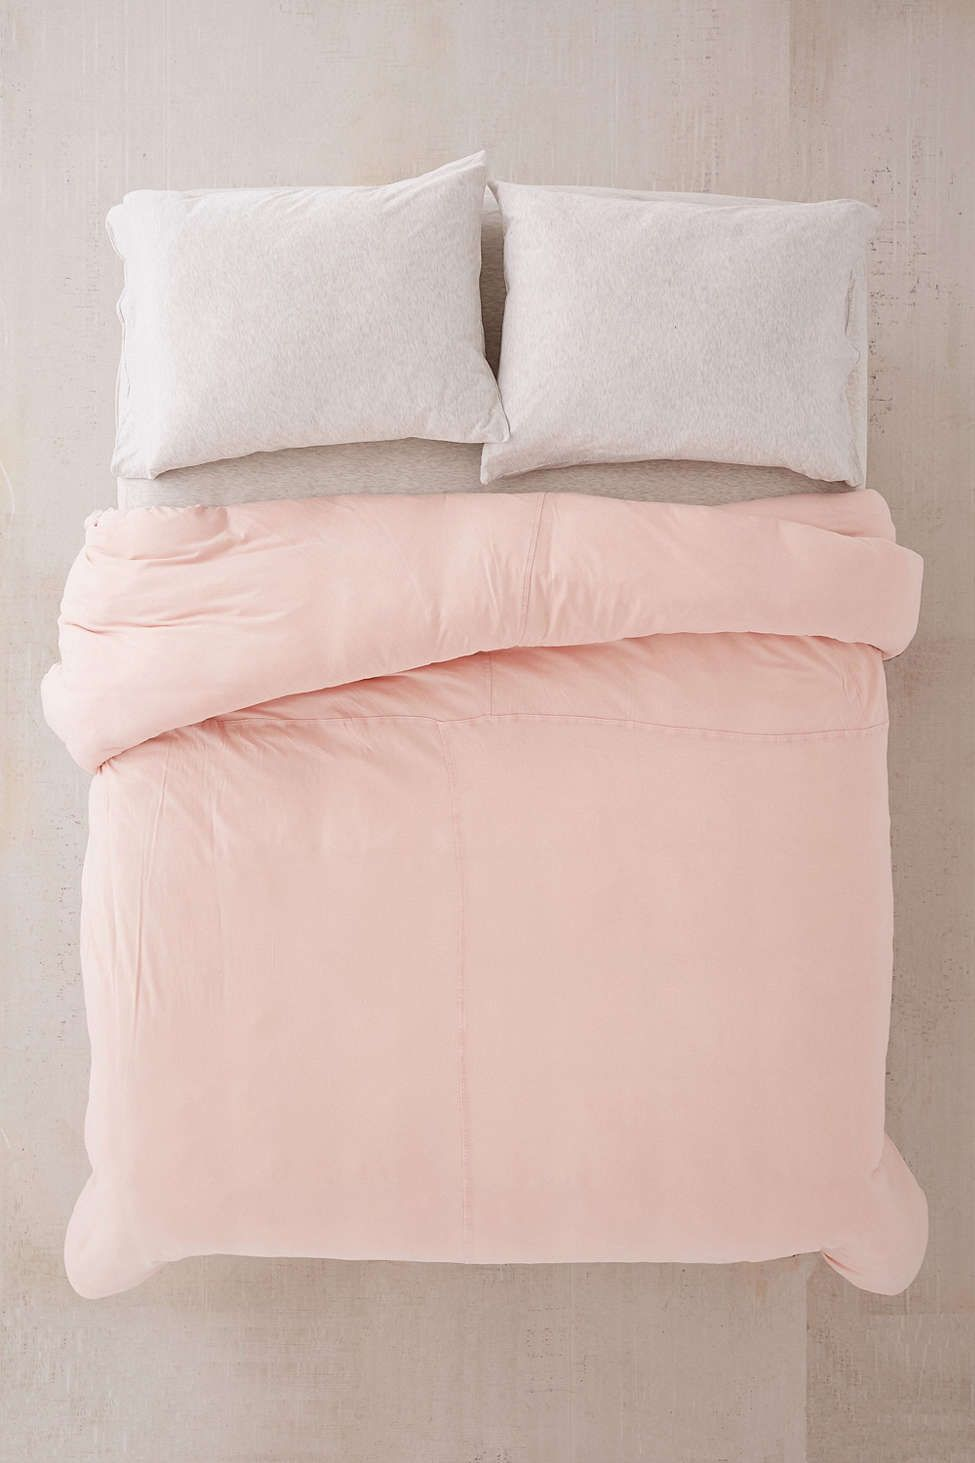 popular to sets bohemian comforter regard dorm duvet boho ideas elegant bedroom the girls prepare covers bedding and grey white with designer modern chic